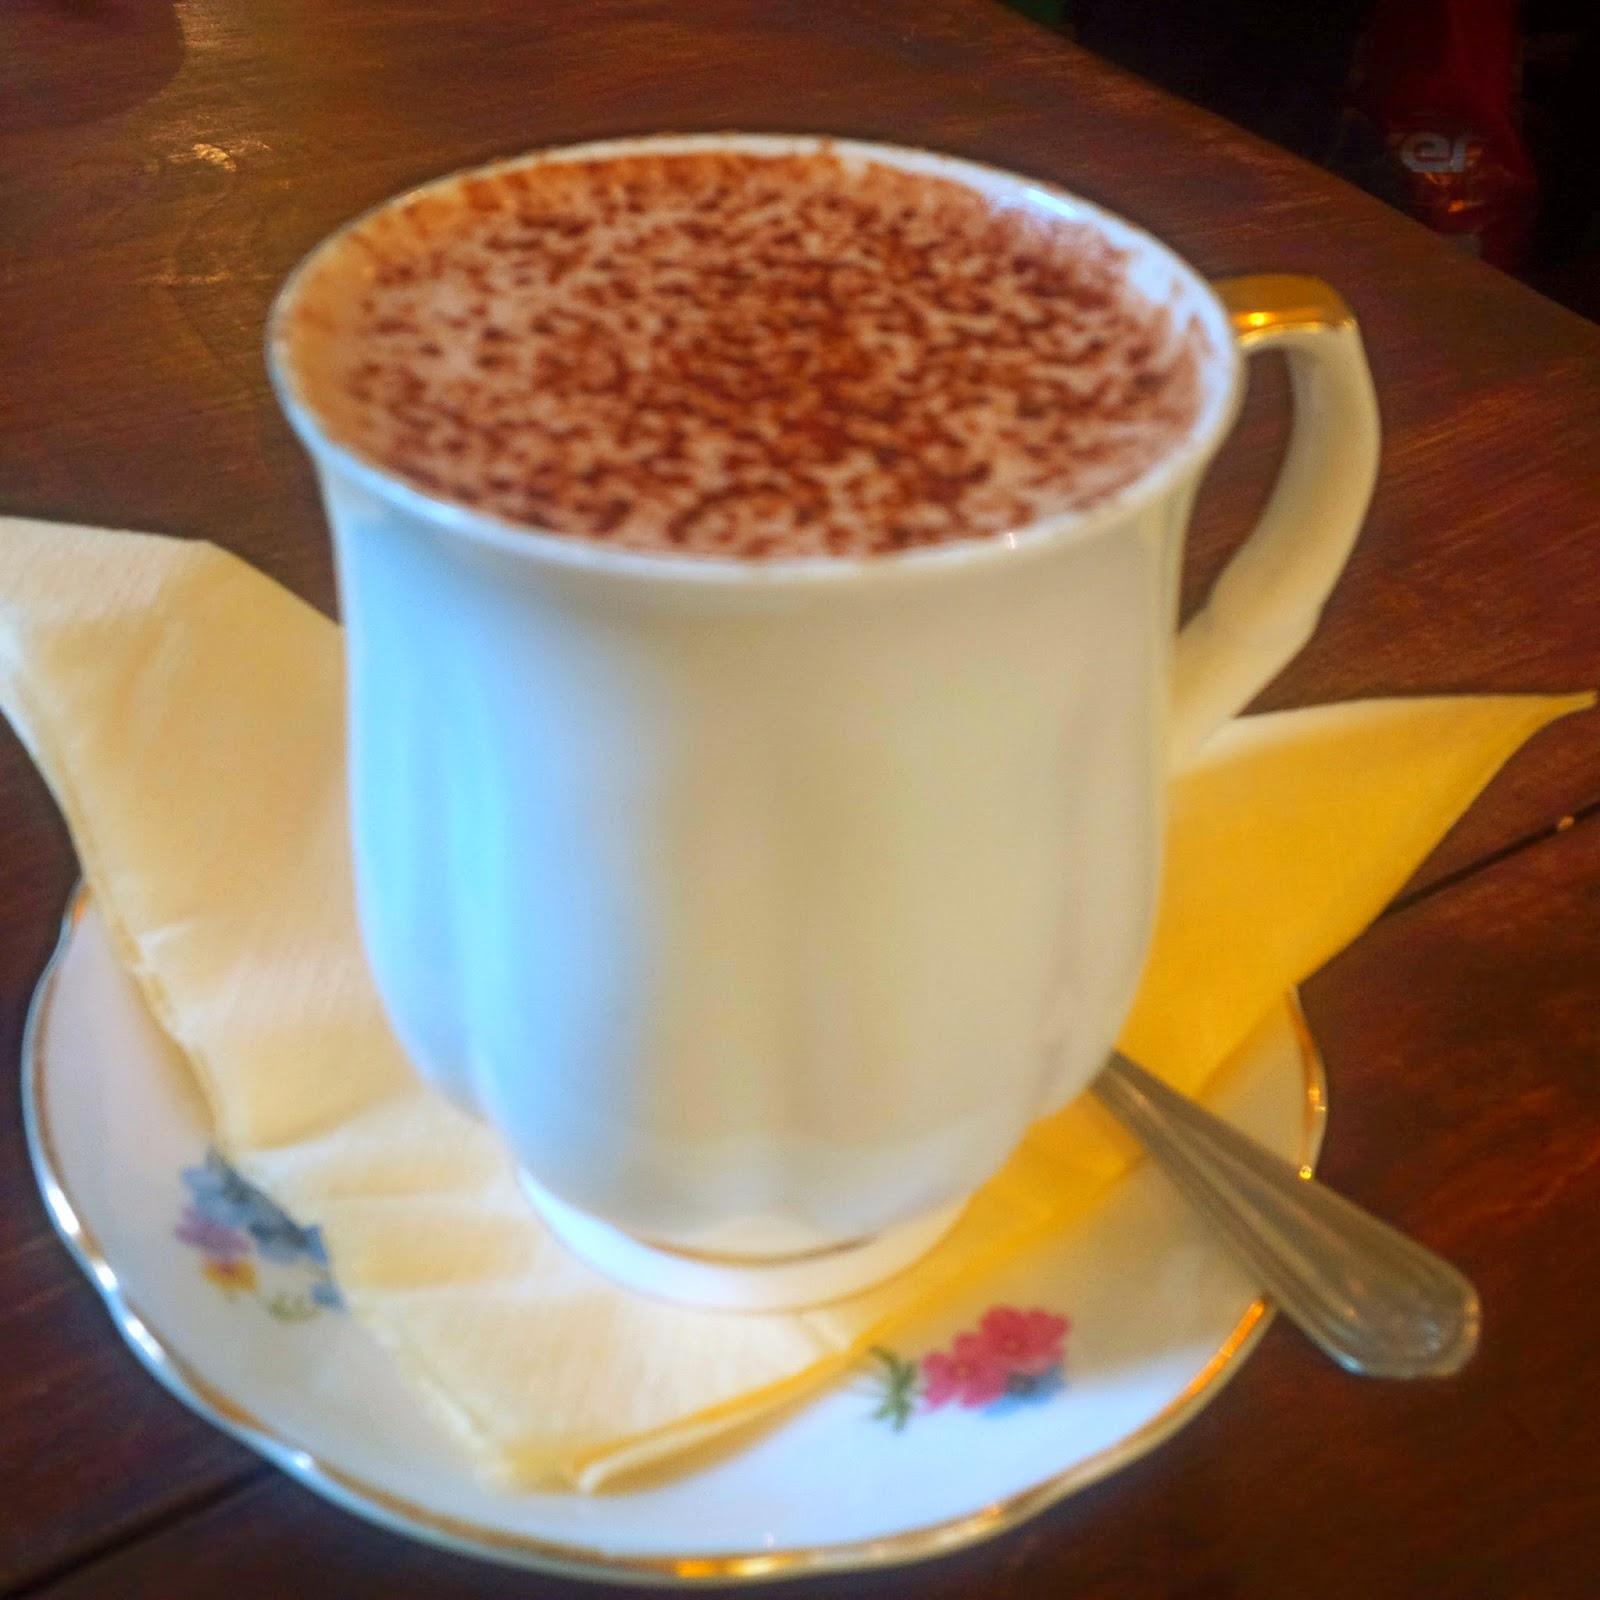 Little Miss Disney: So I REALLY like hot chocolate...